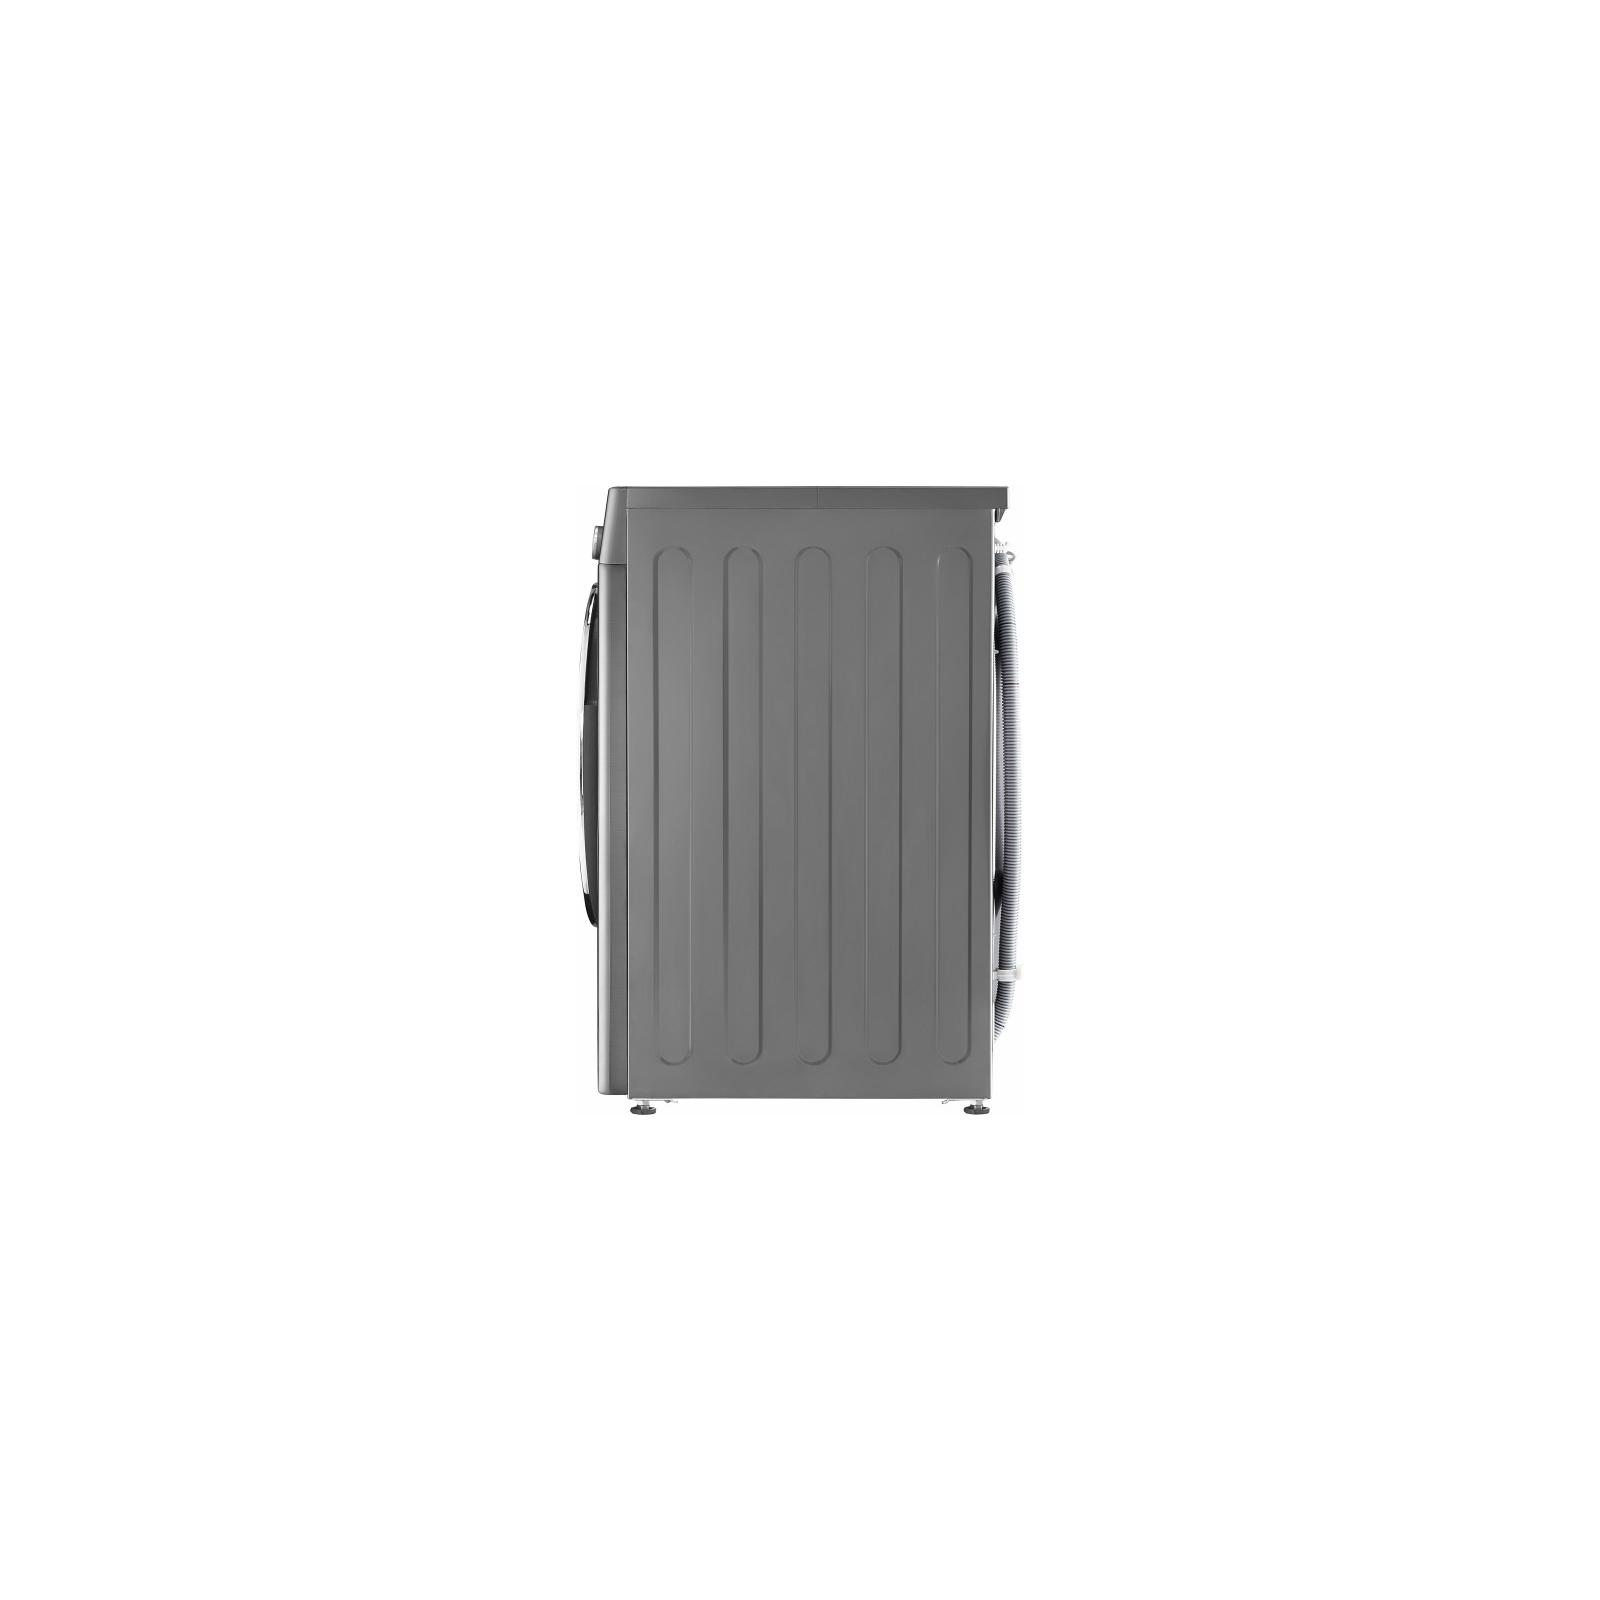 Стиральная машина LG F4V7VW9T изображение 3